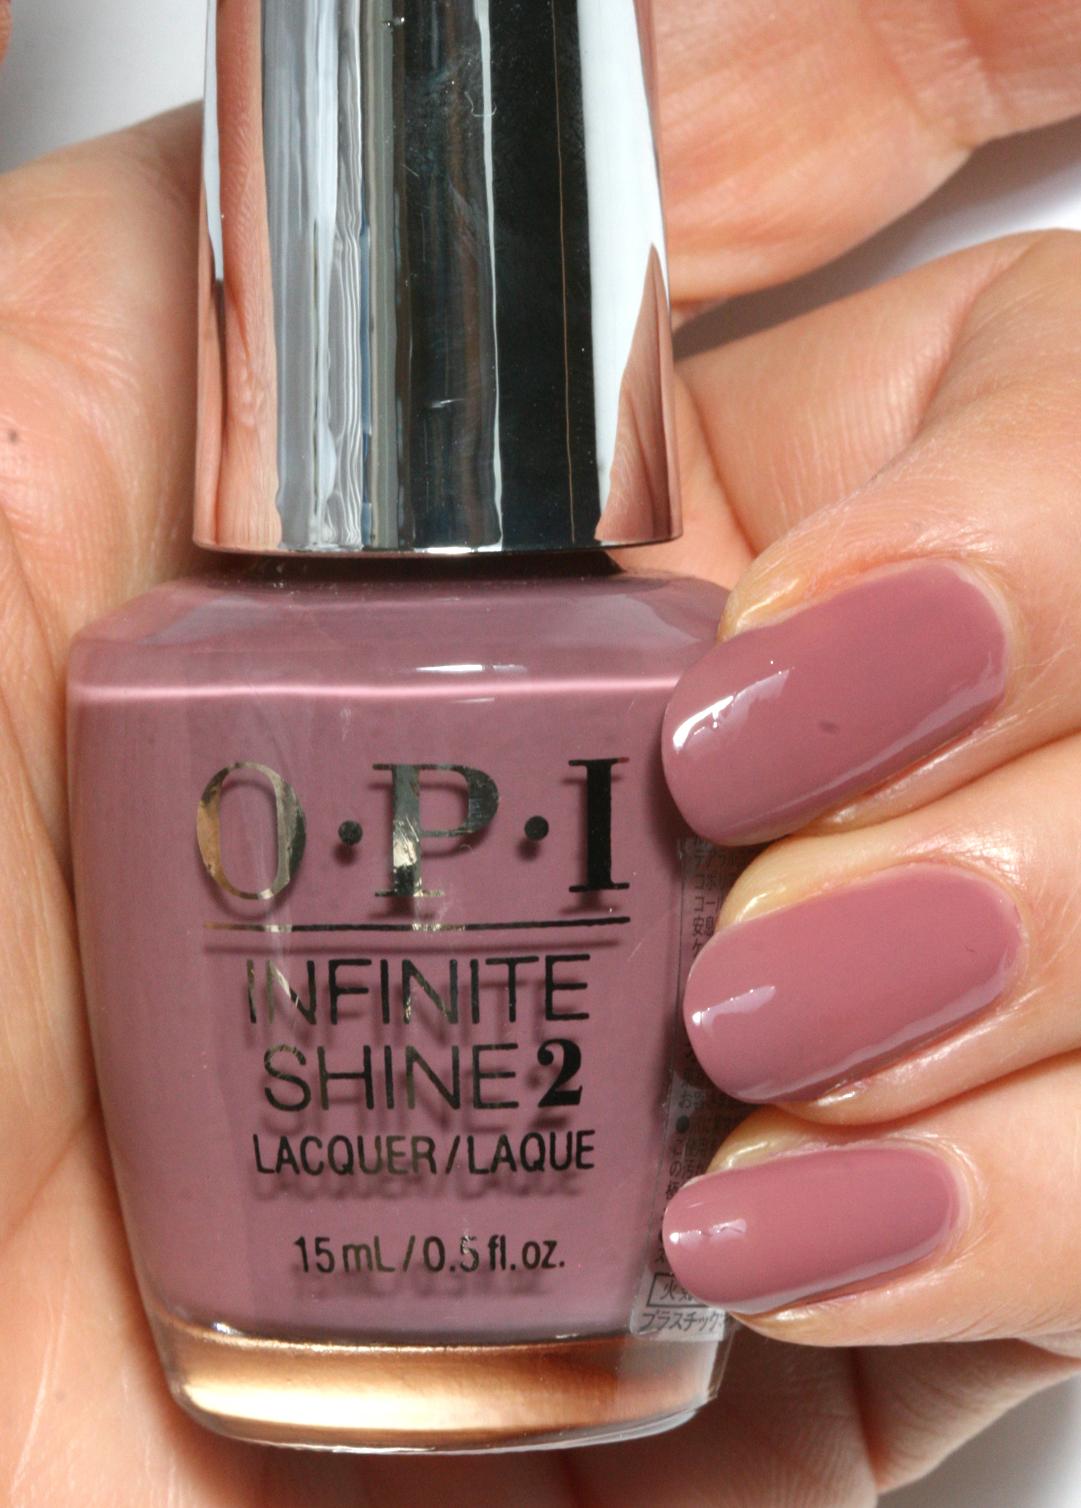 【35%OFF】OPI INFINITE SHINE(インフィニット シャイン) IS-L57 You Sustain Me (ユー サステイン ミー)